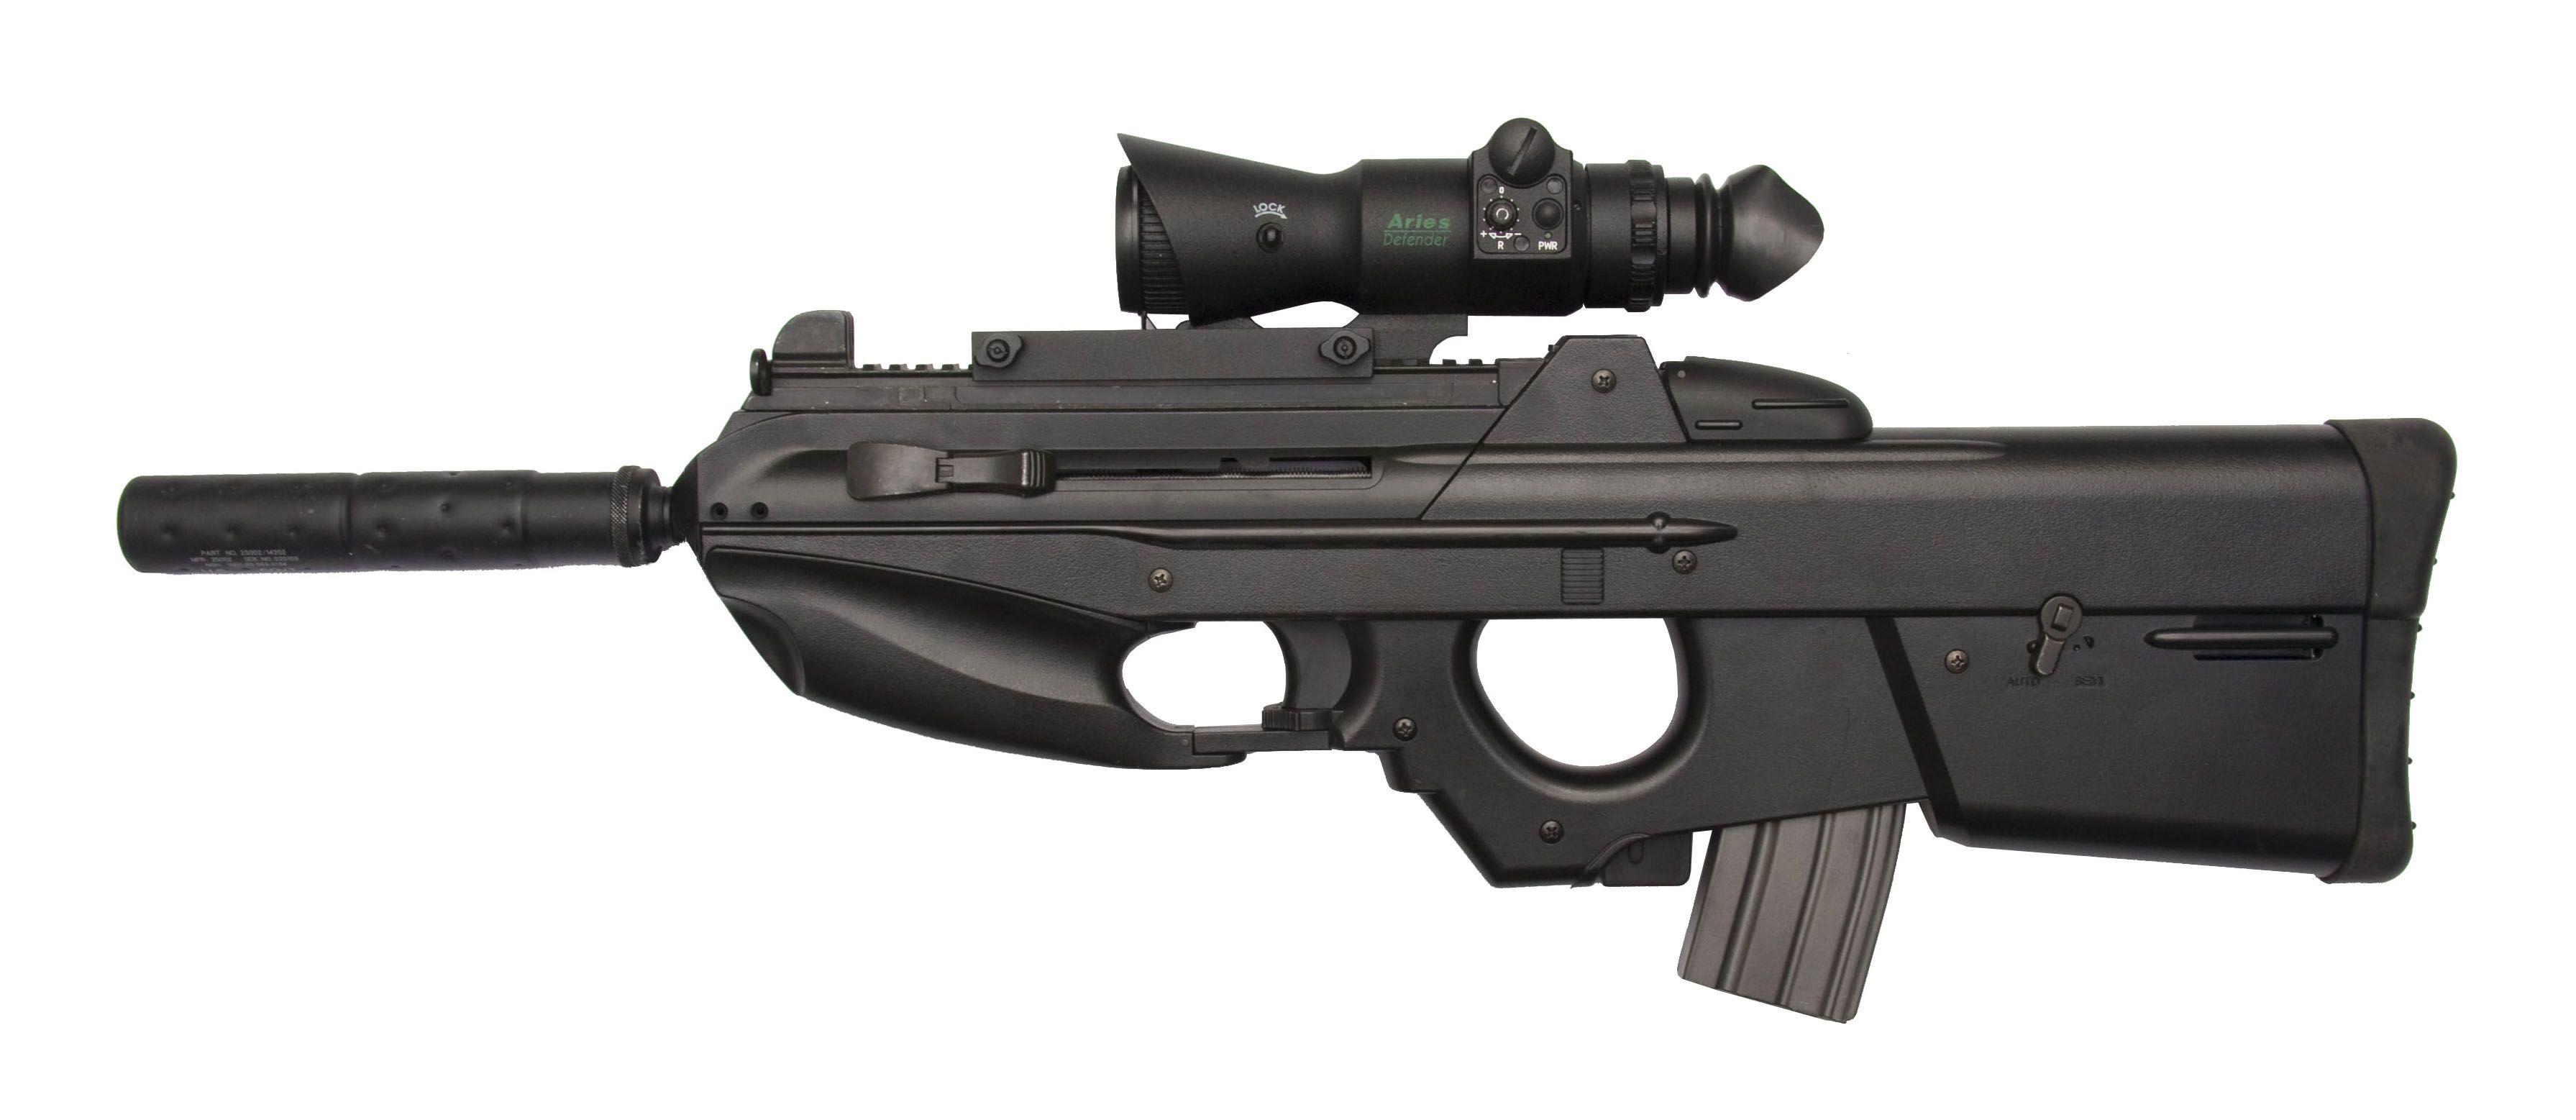 Fad Assault Rifle